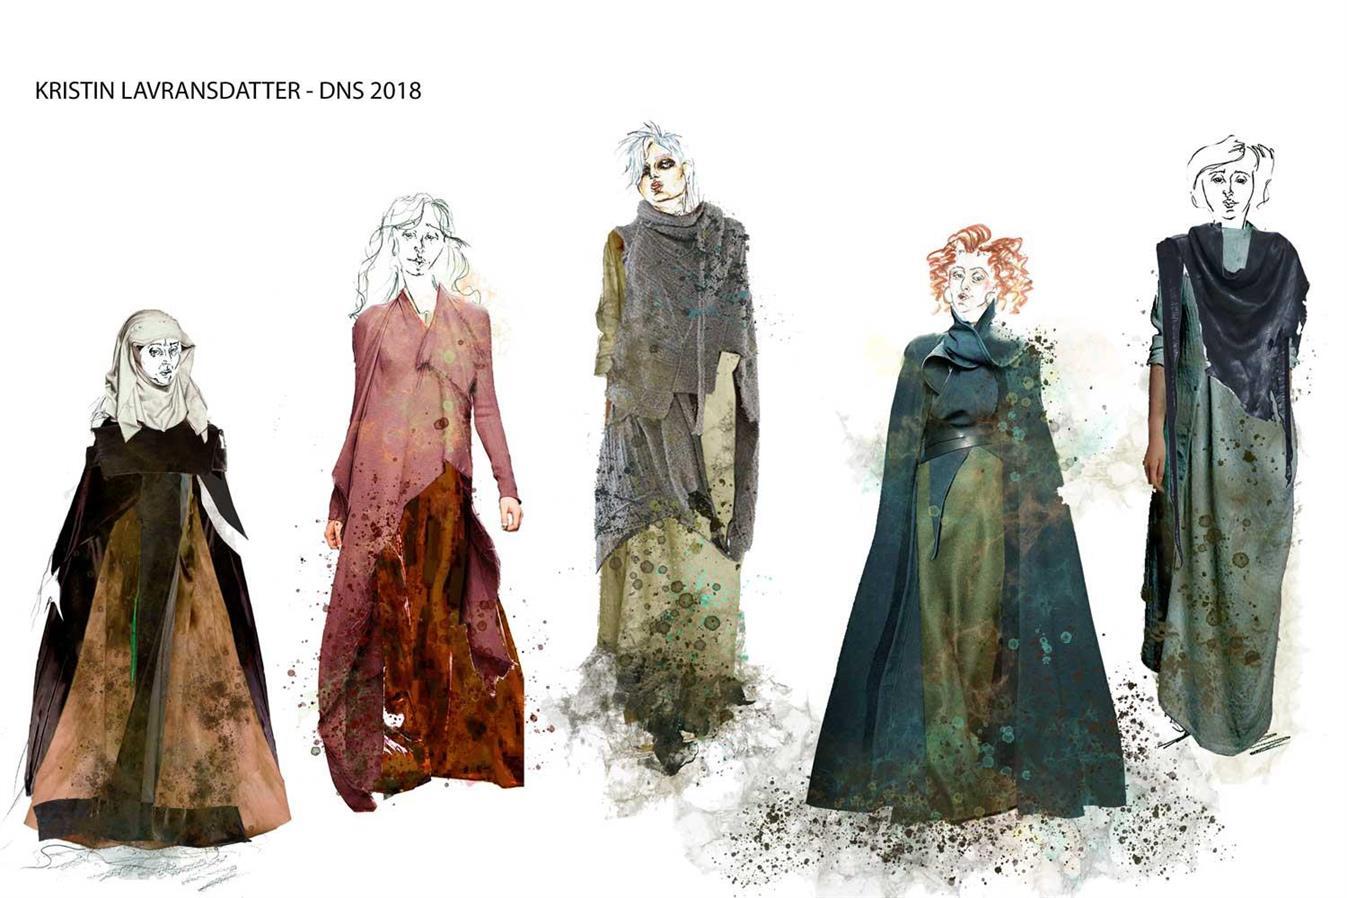 Kristin Lavransdatter - Den Nasjonale Scene - Director: Svein Sturla Hugnes - Costume Design: Christina Lovery